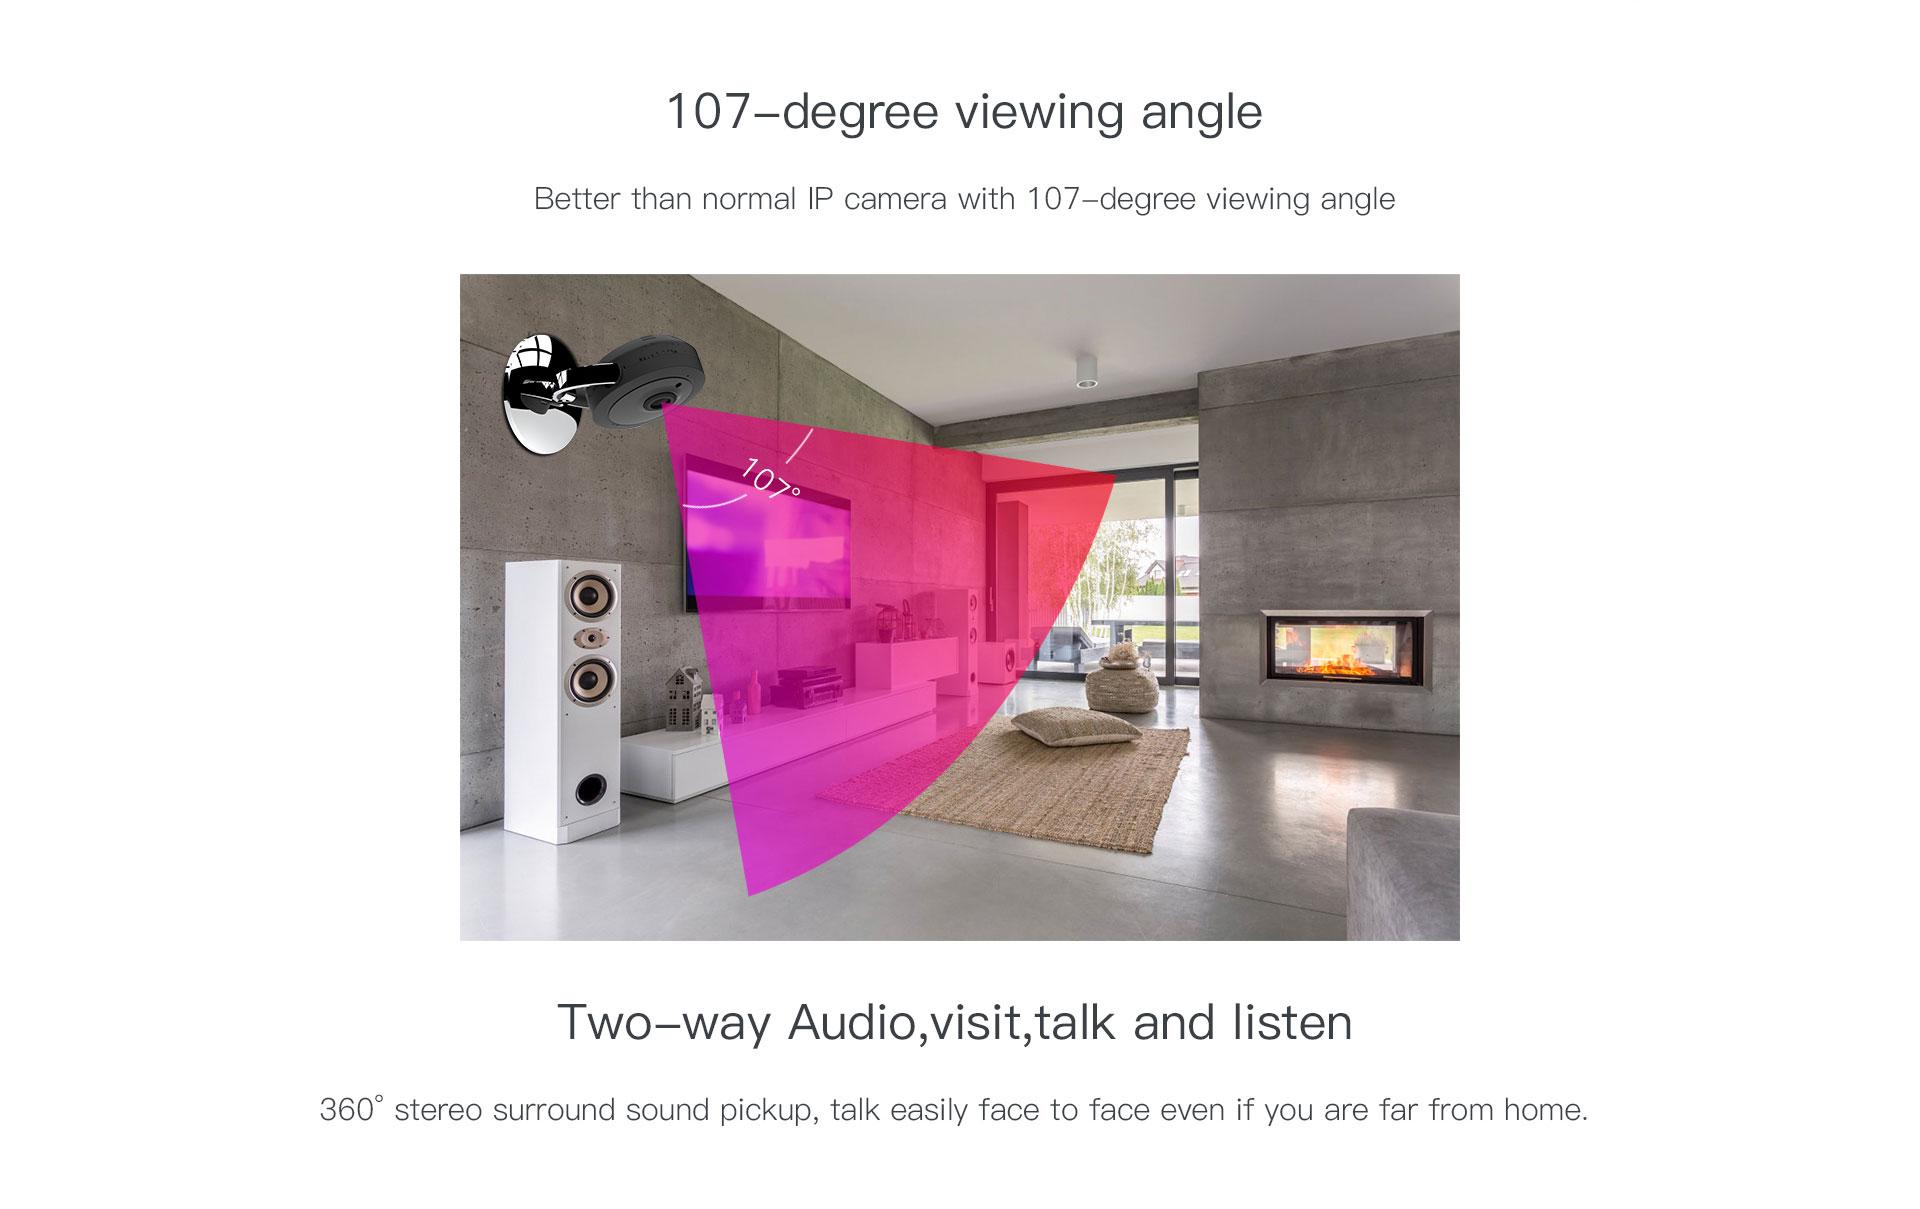 cube indoor camera